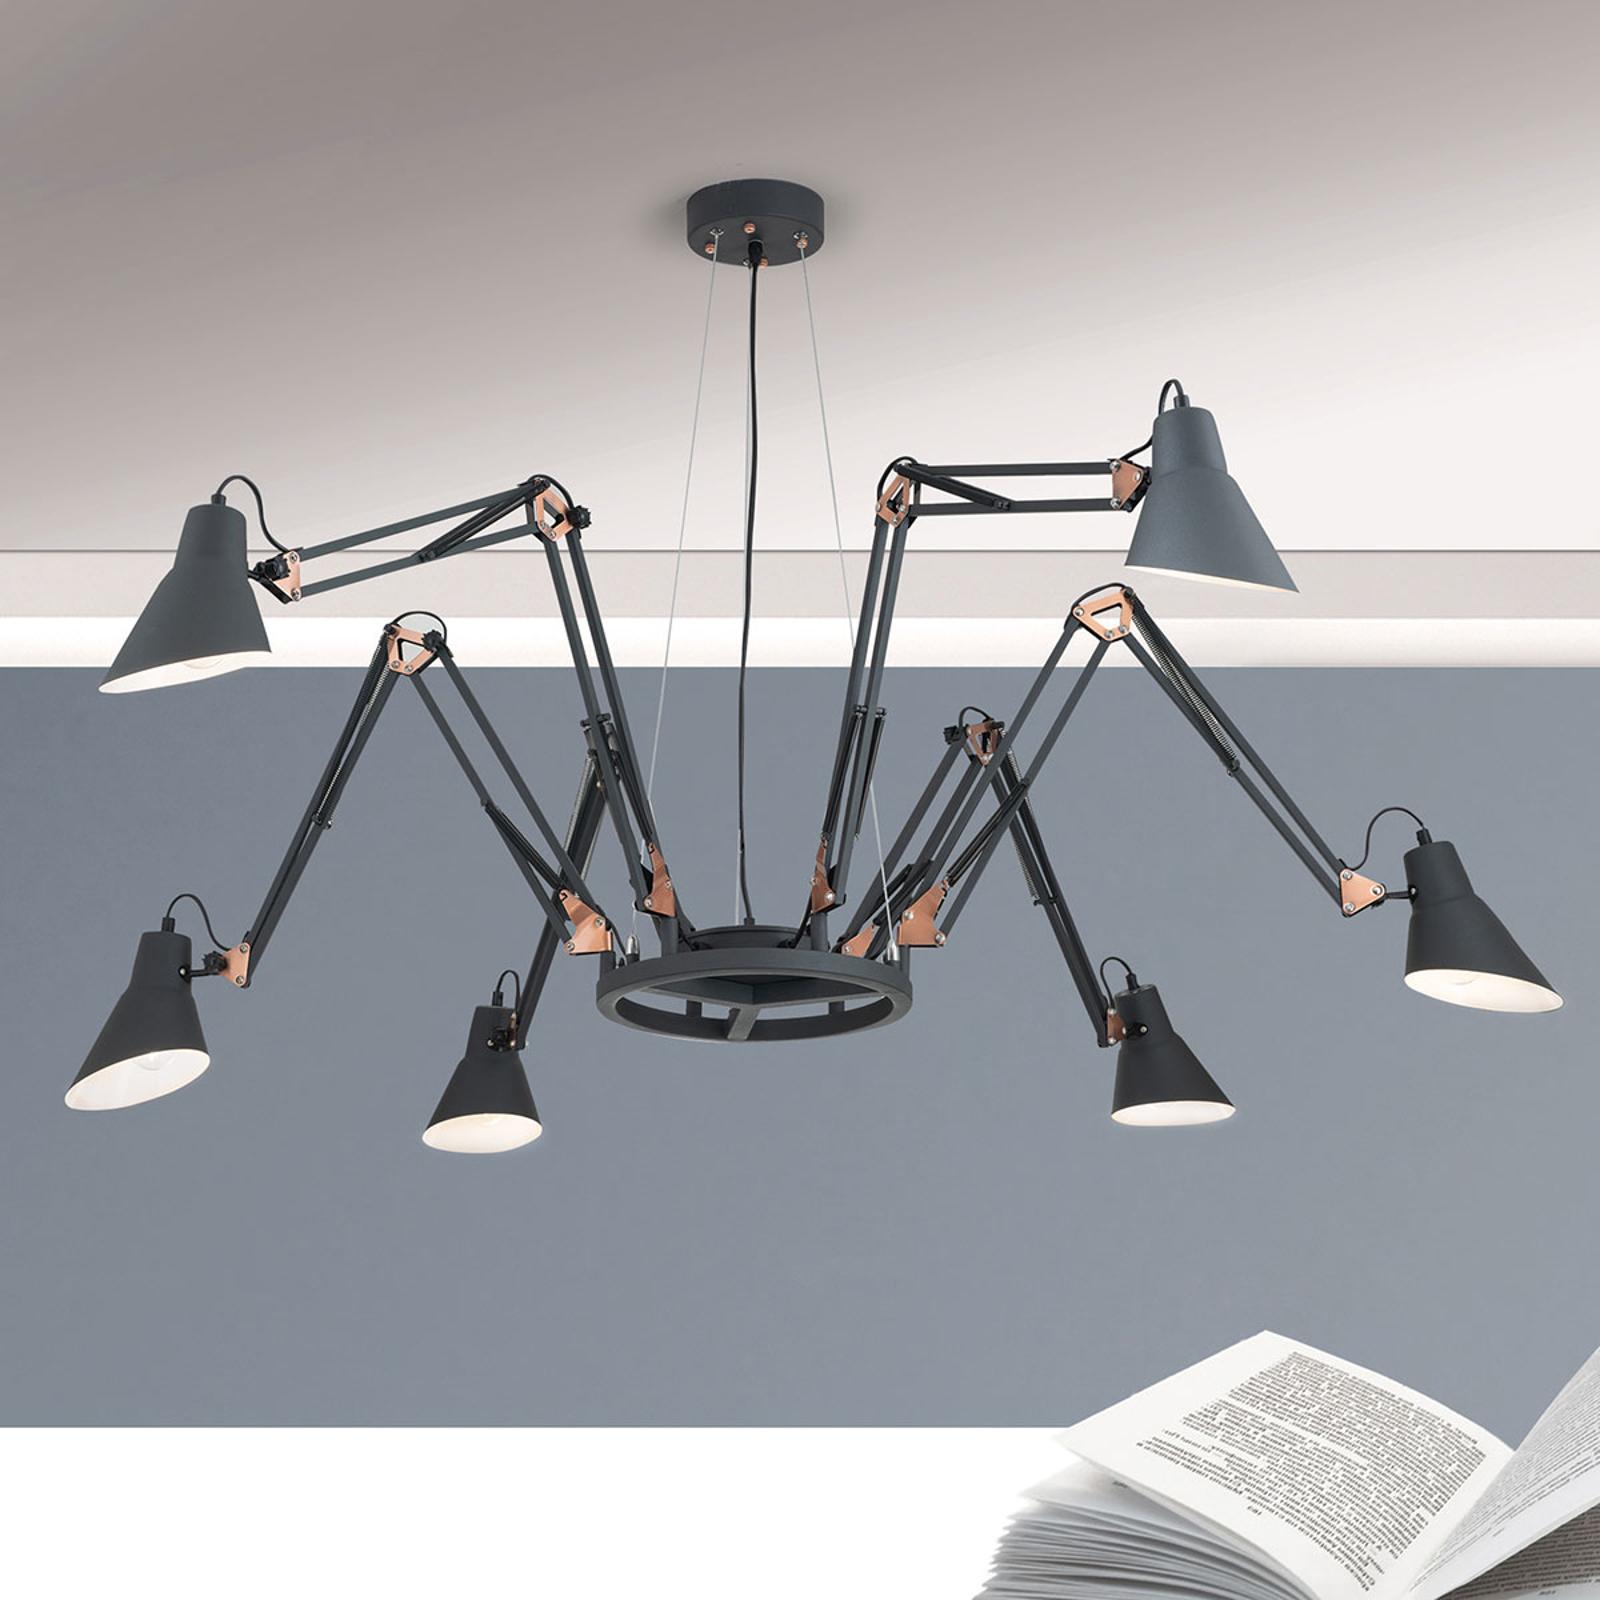 Hanglamp Bachelor 6-lamps - armen instelbaar